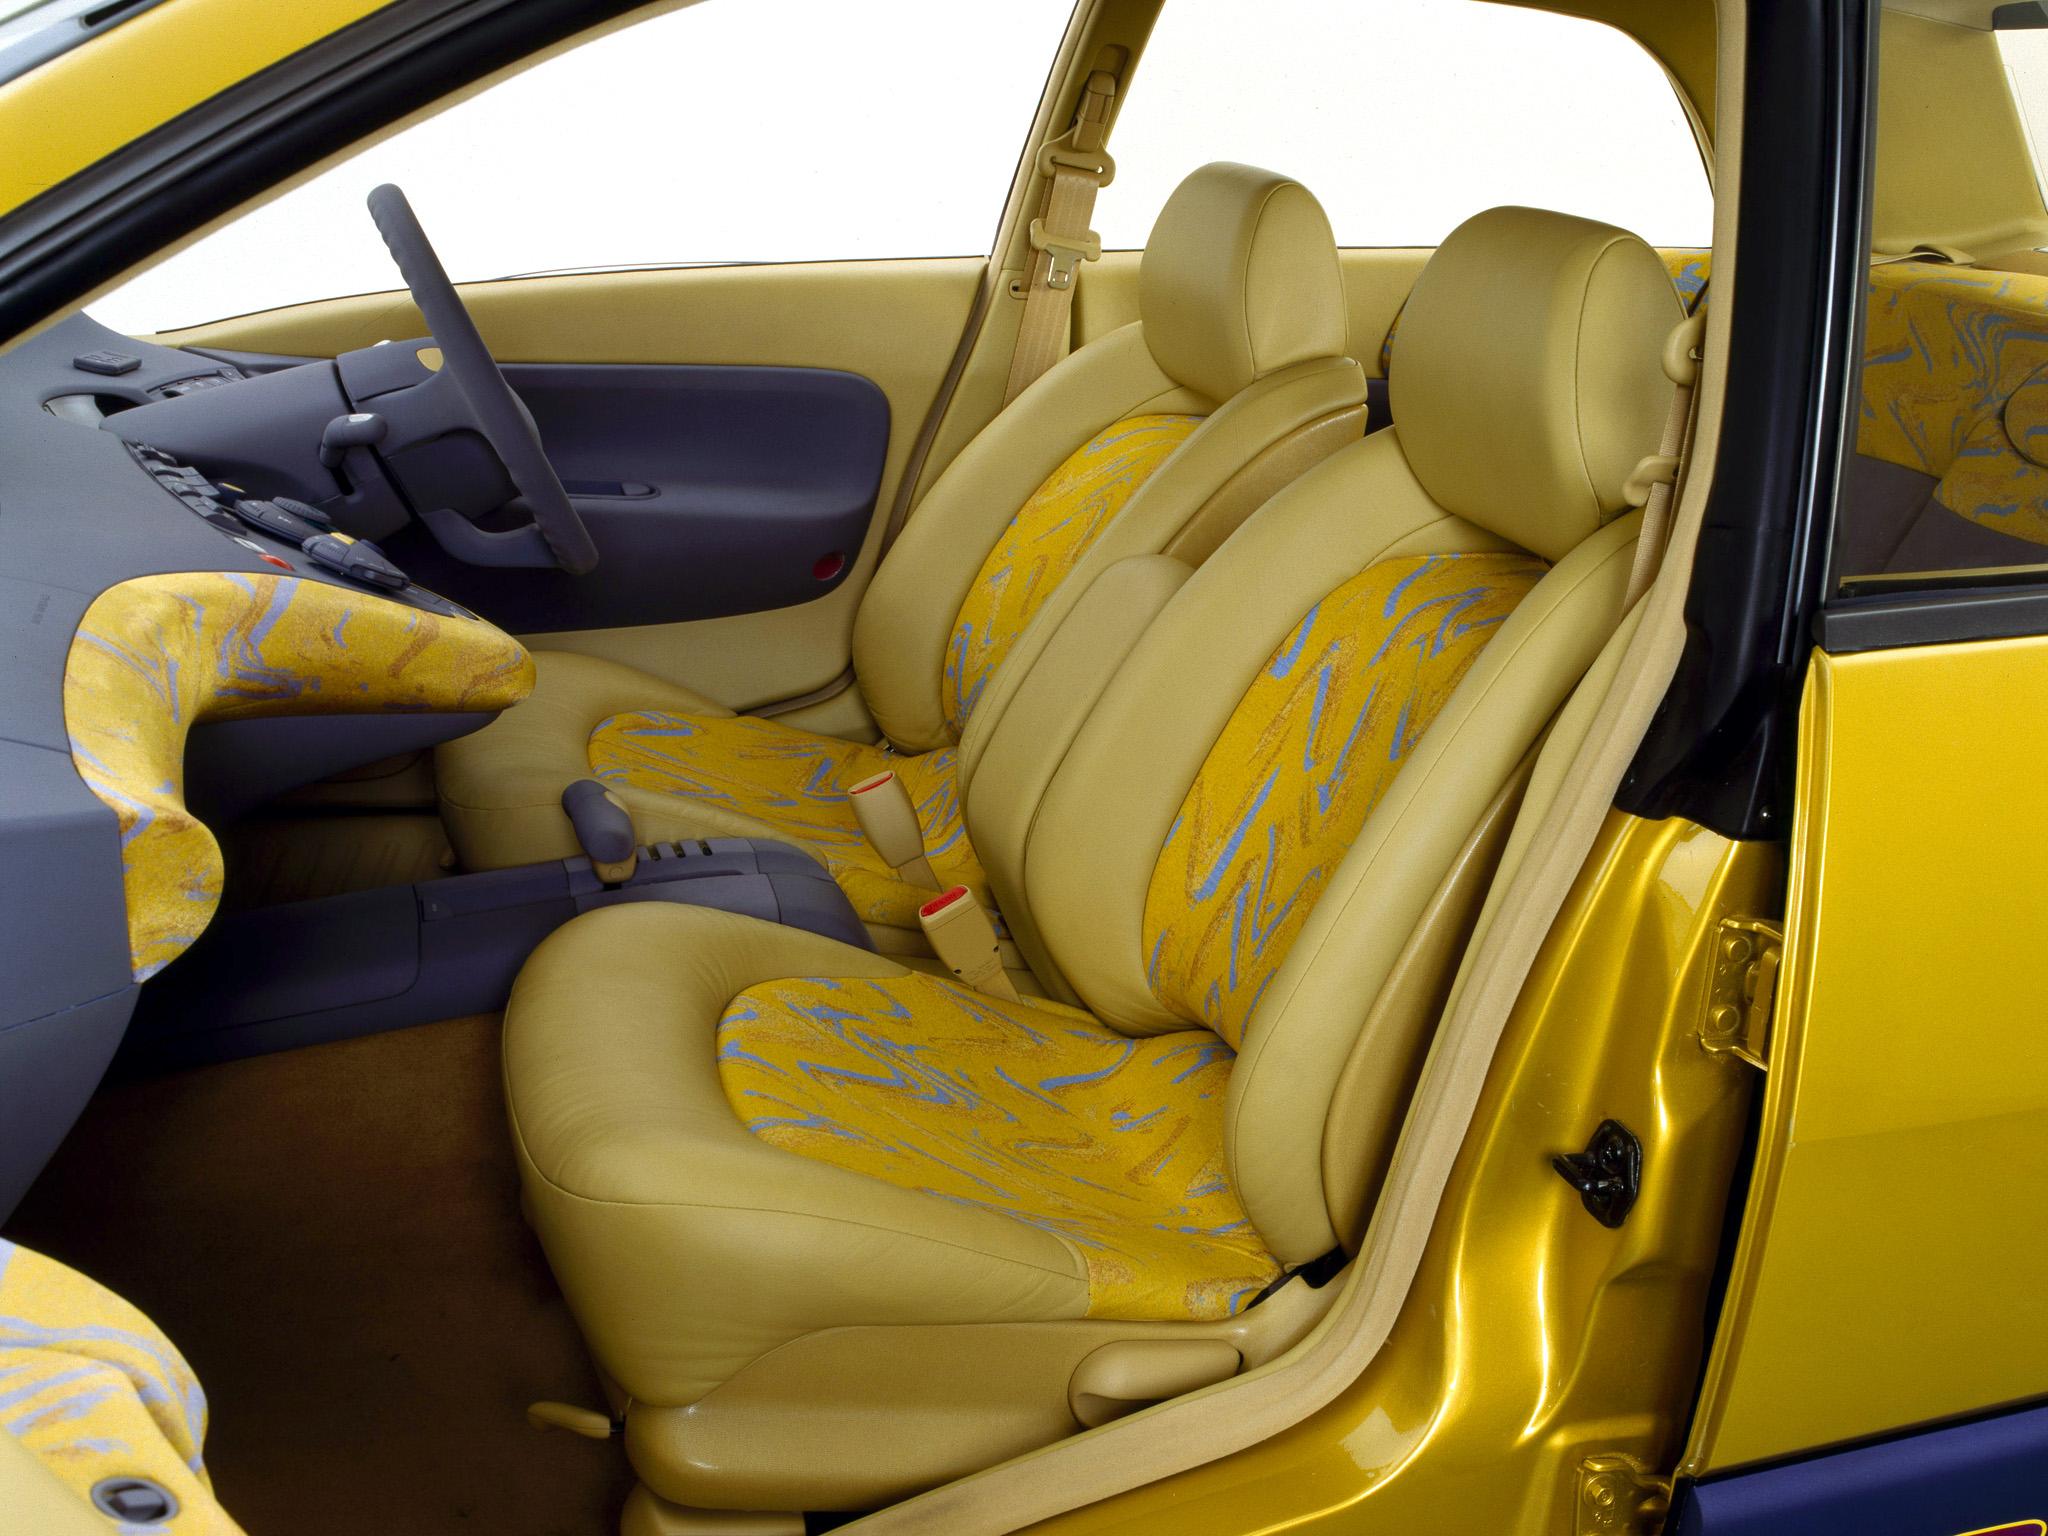 1995 nissan cq x concepts nissan cq x concept 1995 interior vanachro Gallery